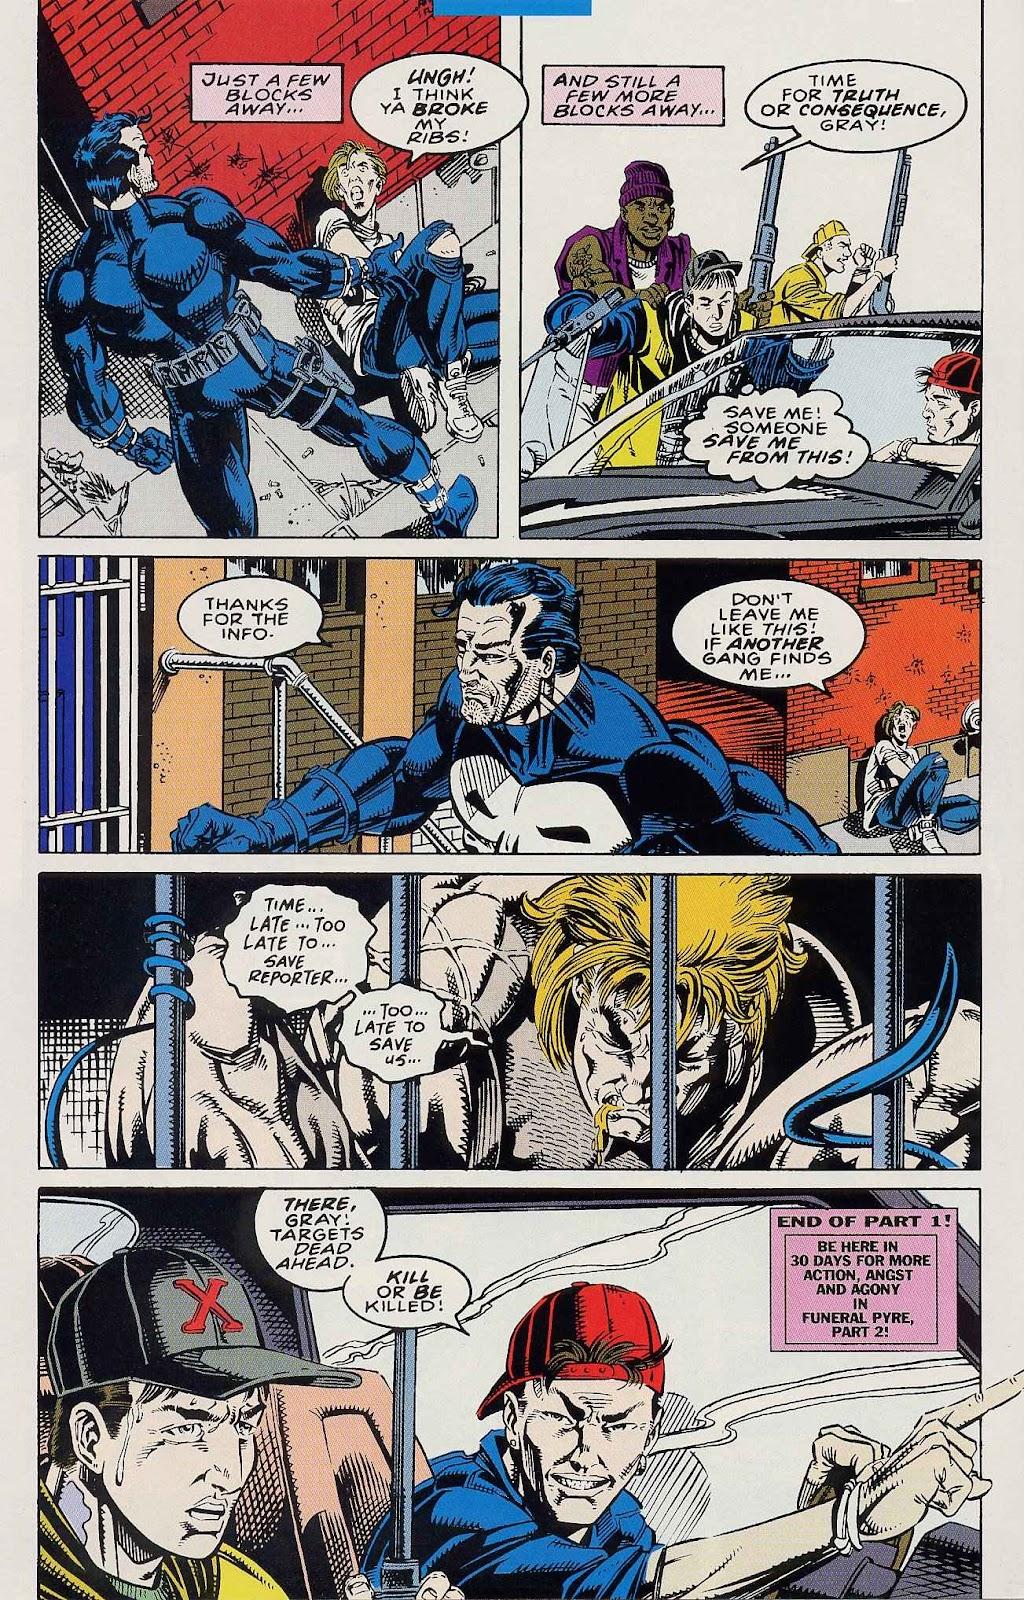 Comic Venom: Funeral Pyre issue 1